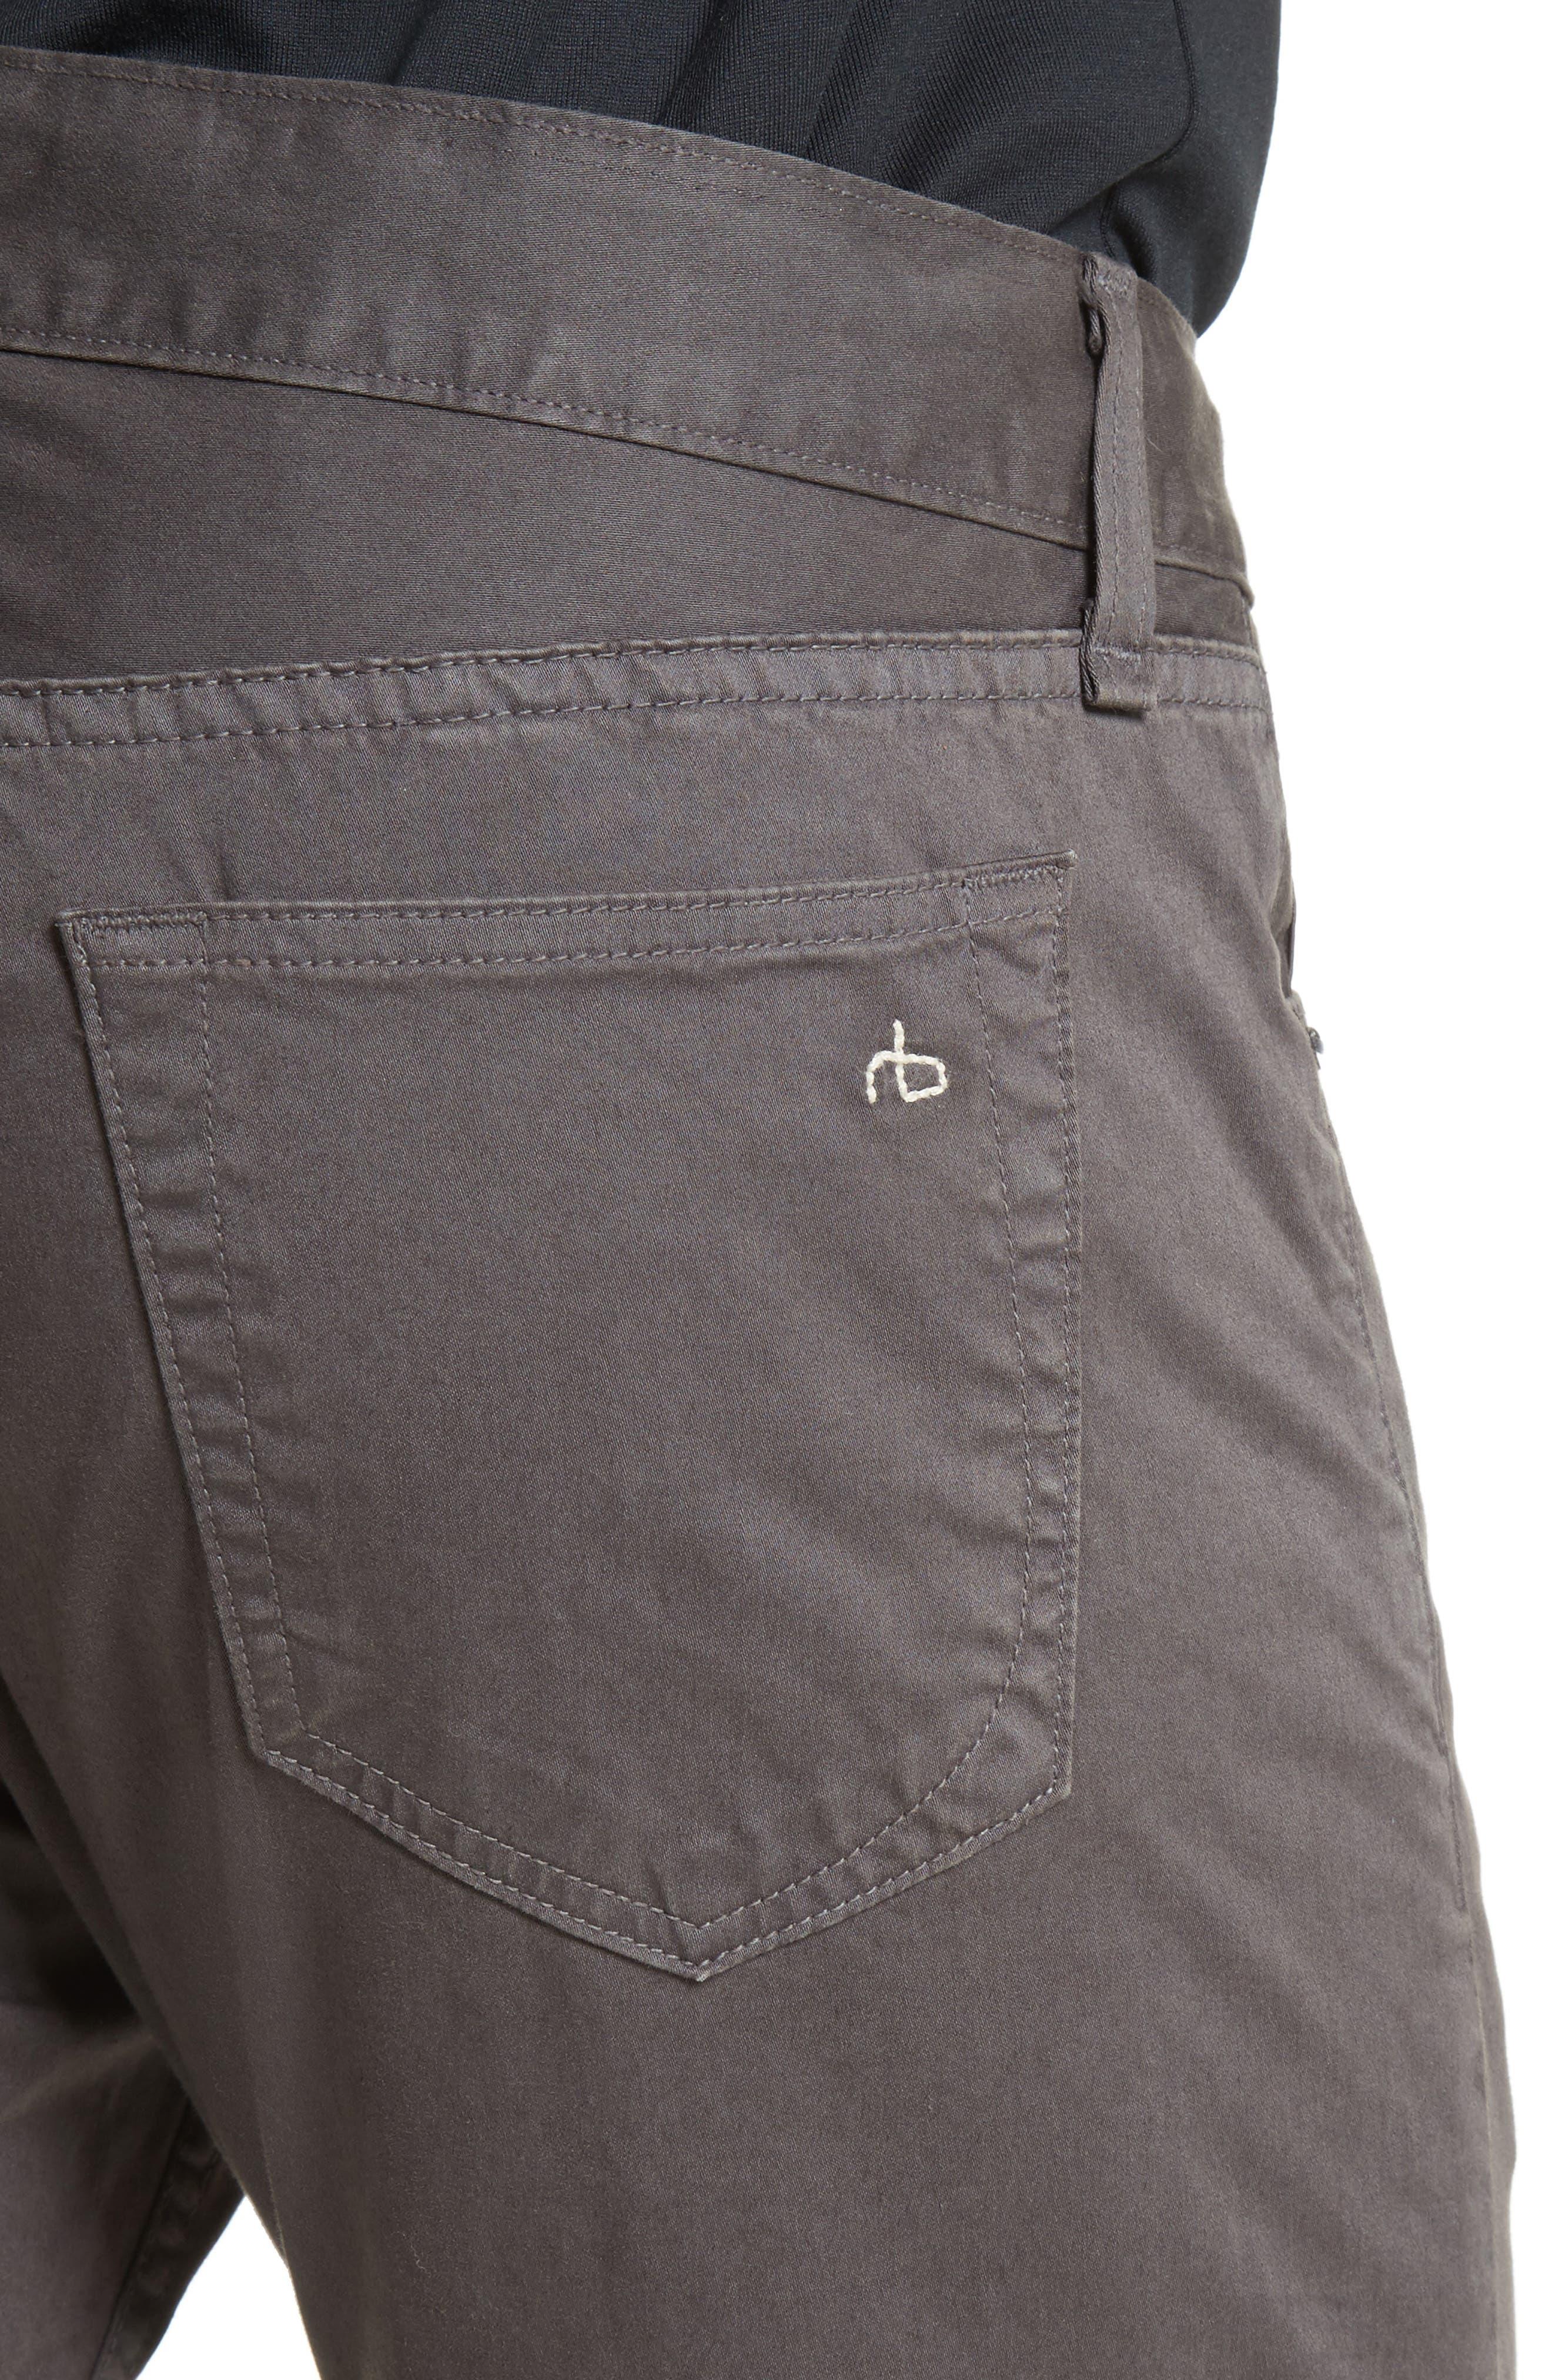 Fit 2 Slim Five-Pocket Pants,                             Alternate thumbnail 4, color,                             GREY